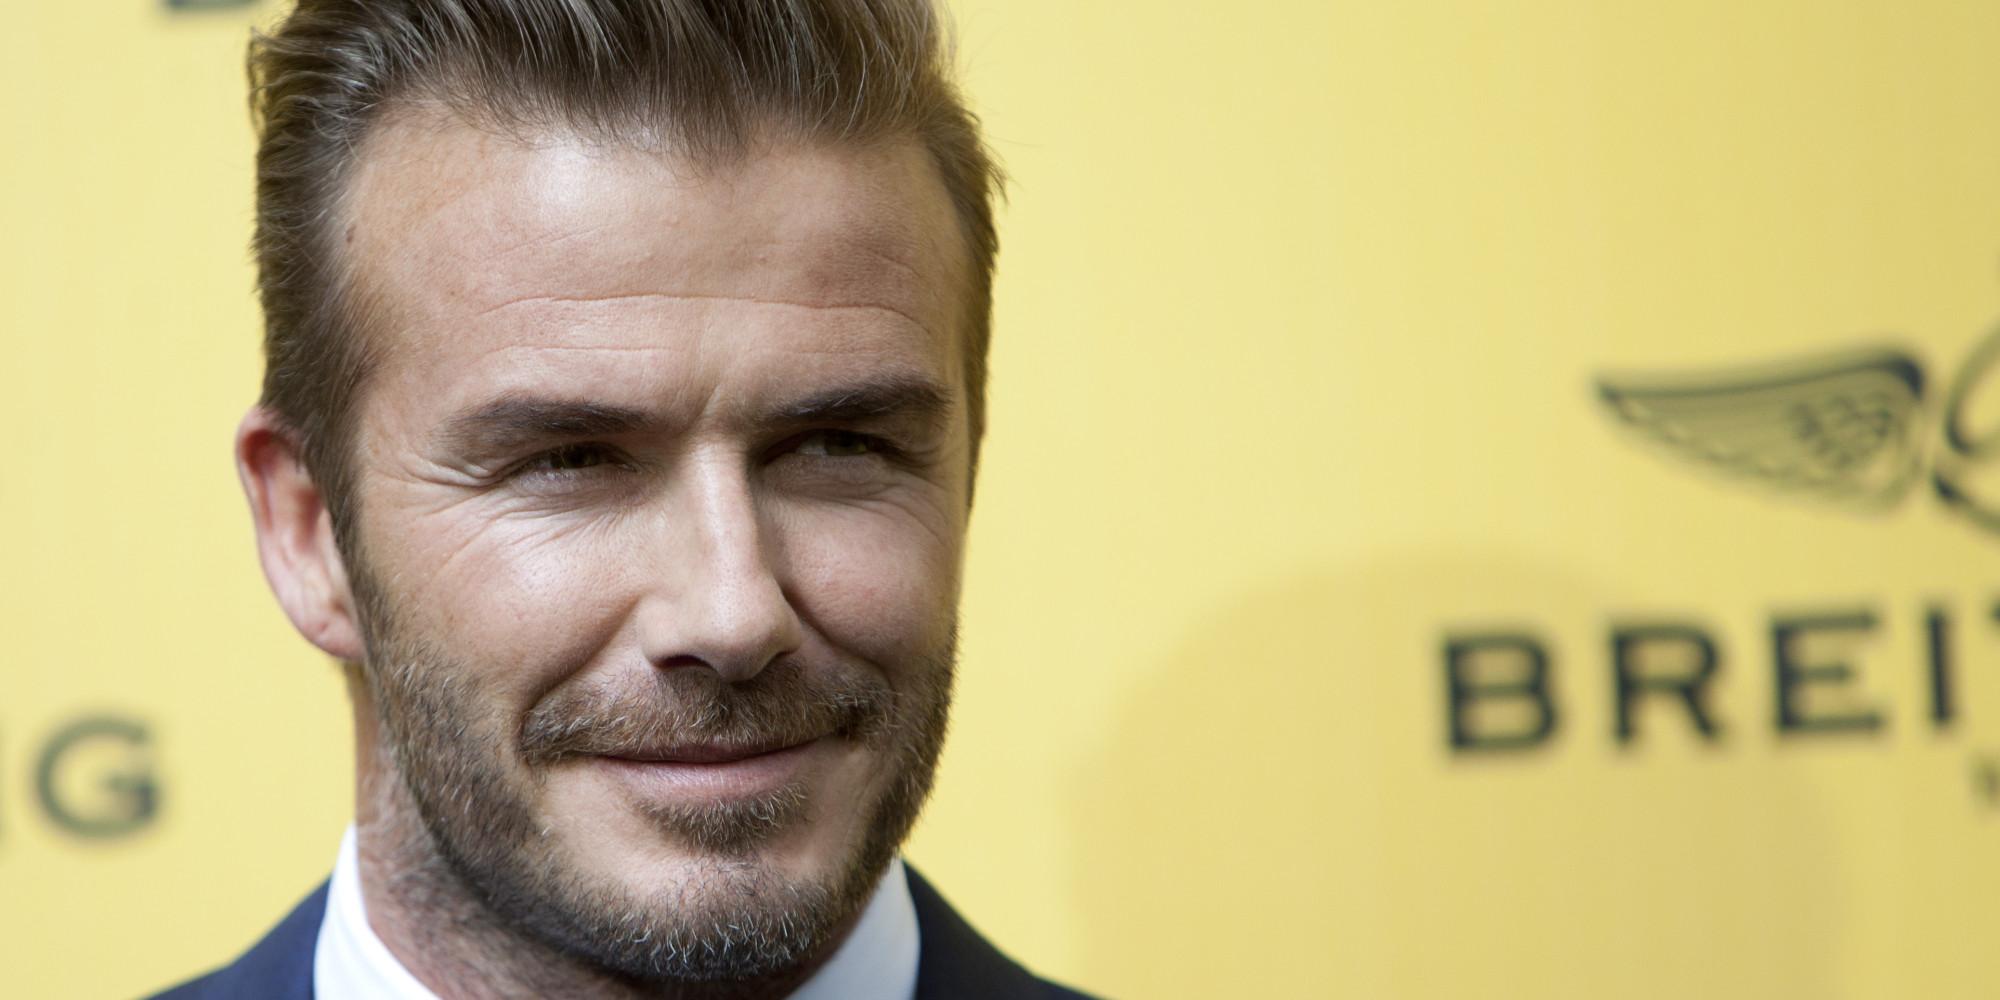 David Beckham élu l'homme le plus sexy selon People David Beckham Facebook